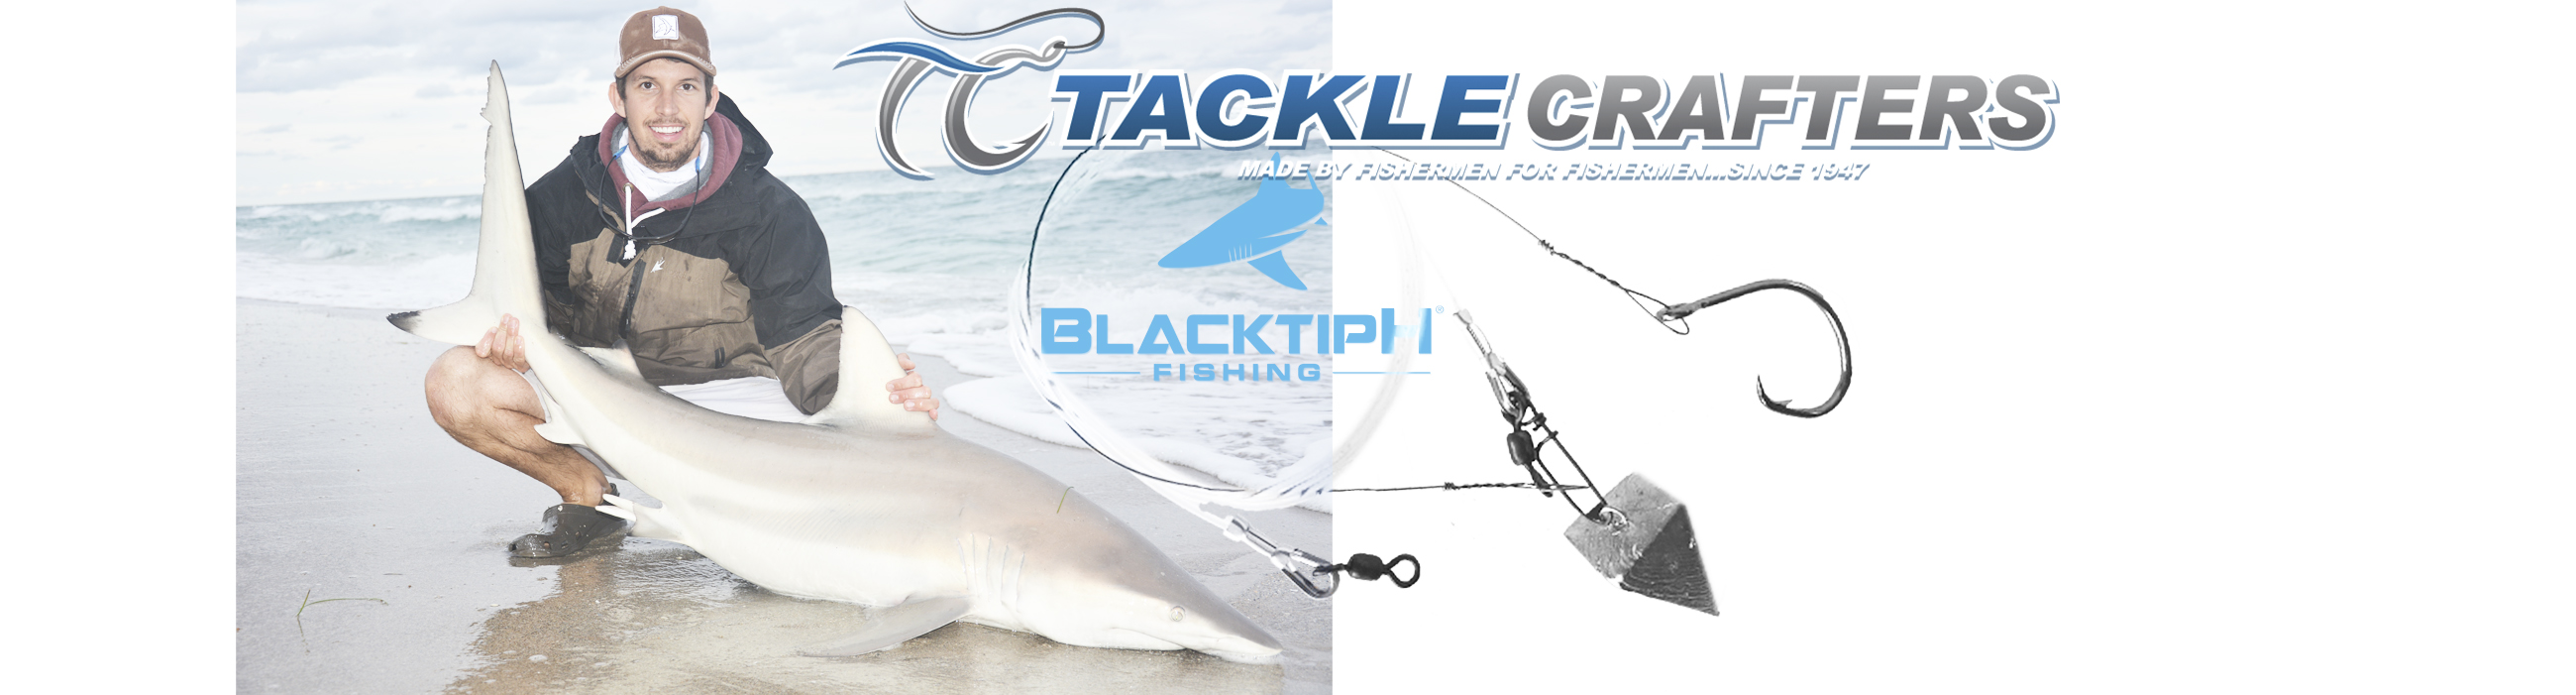 blacktiph-slider-template